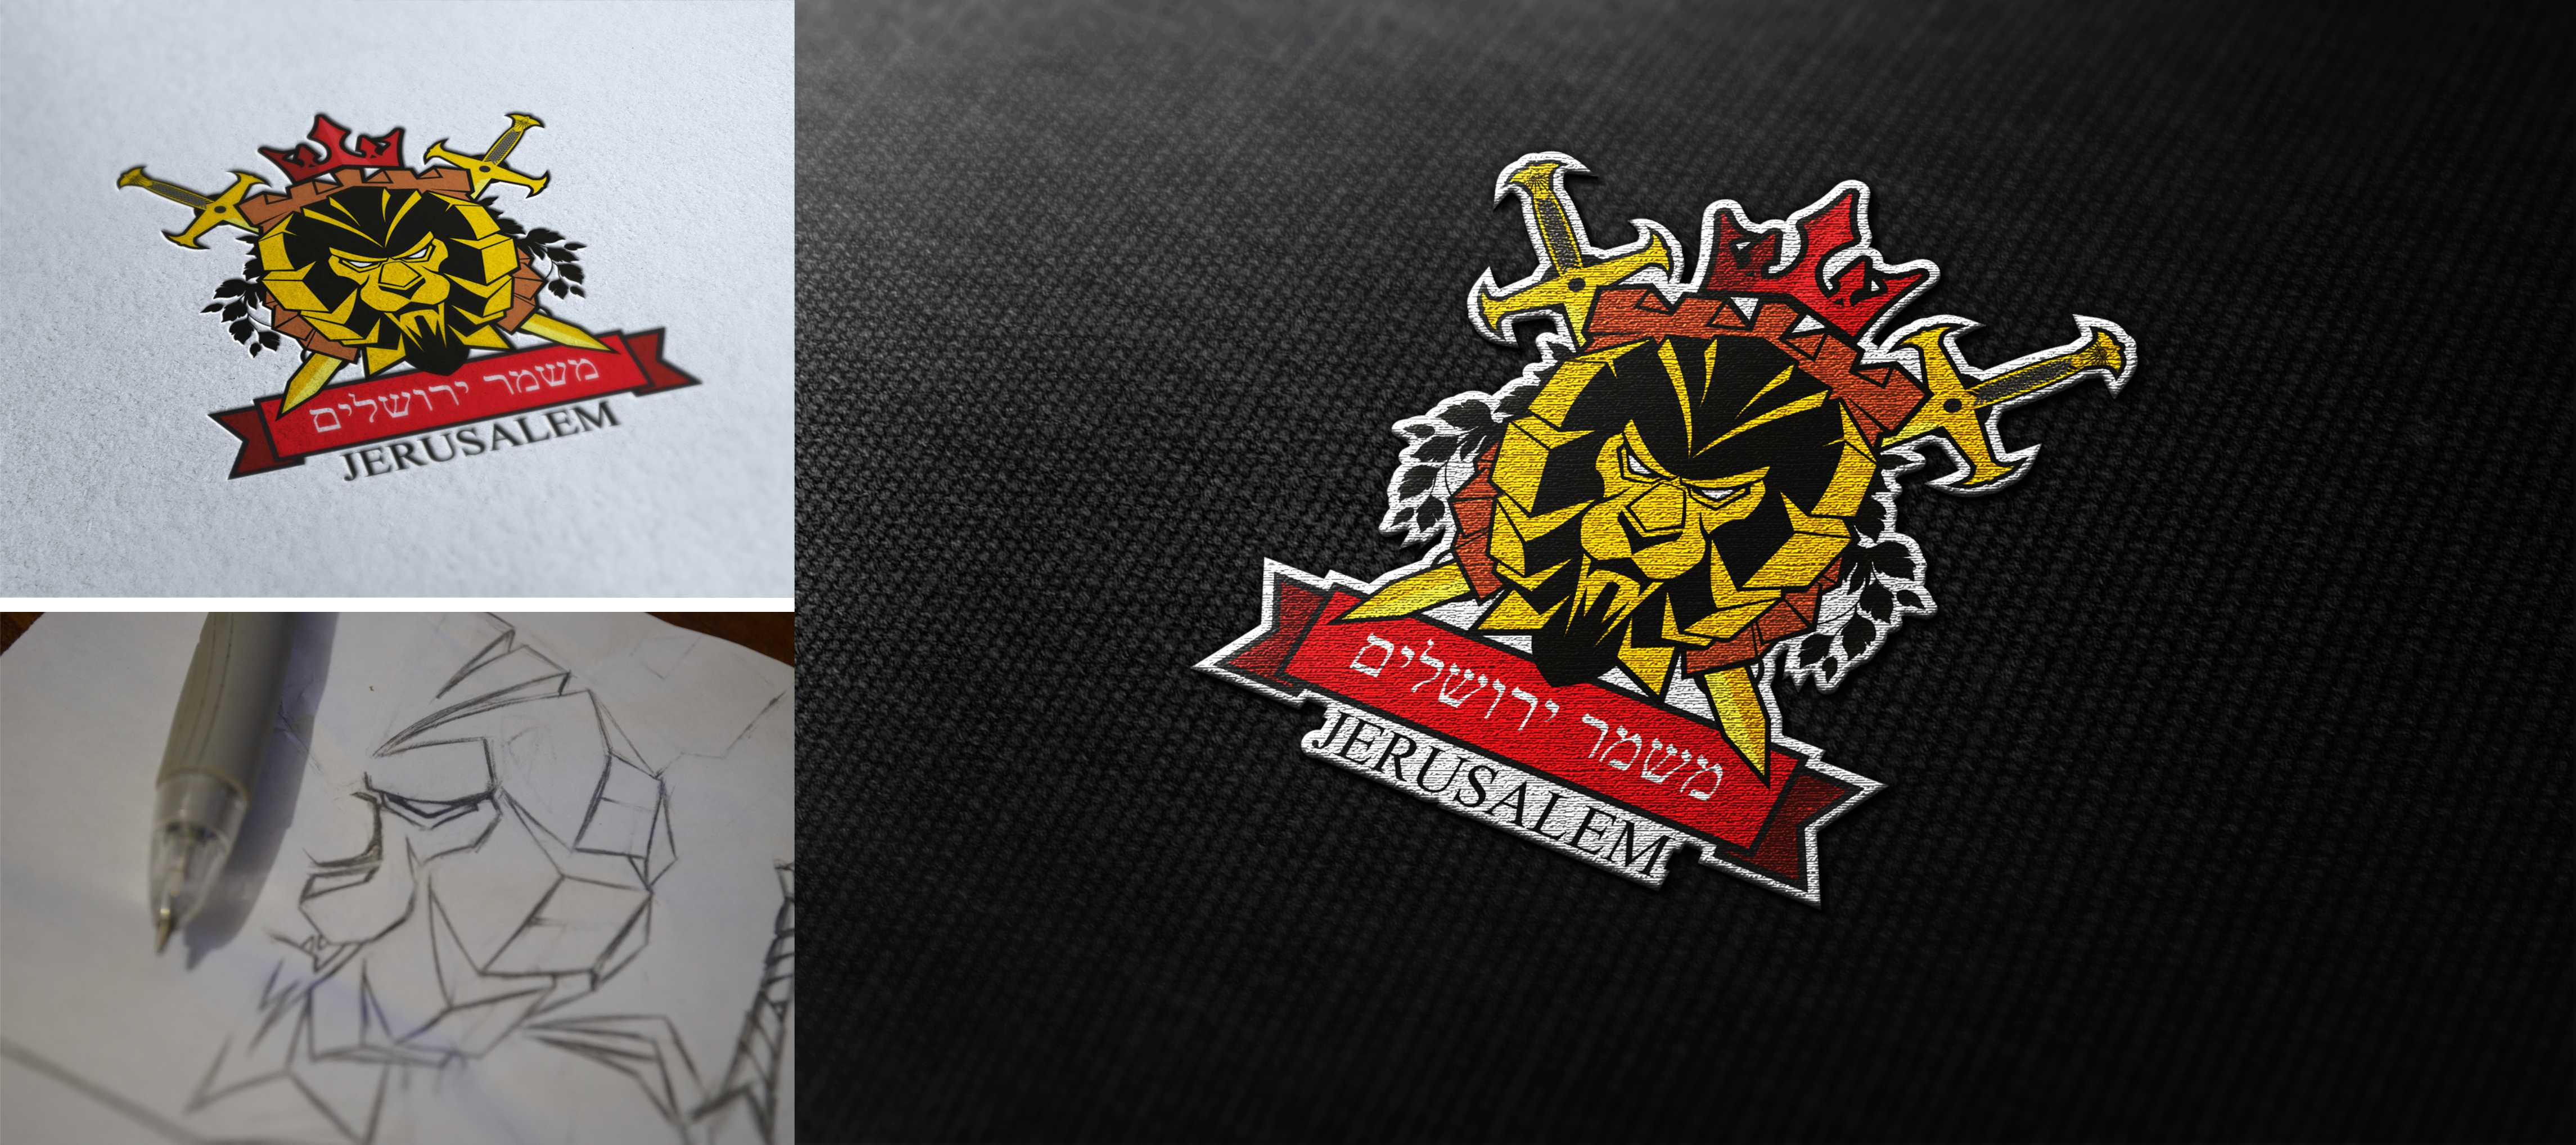 Разработка логотипа. Компания Страж Иерусалима фото f_92451f13763c7859.jpg